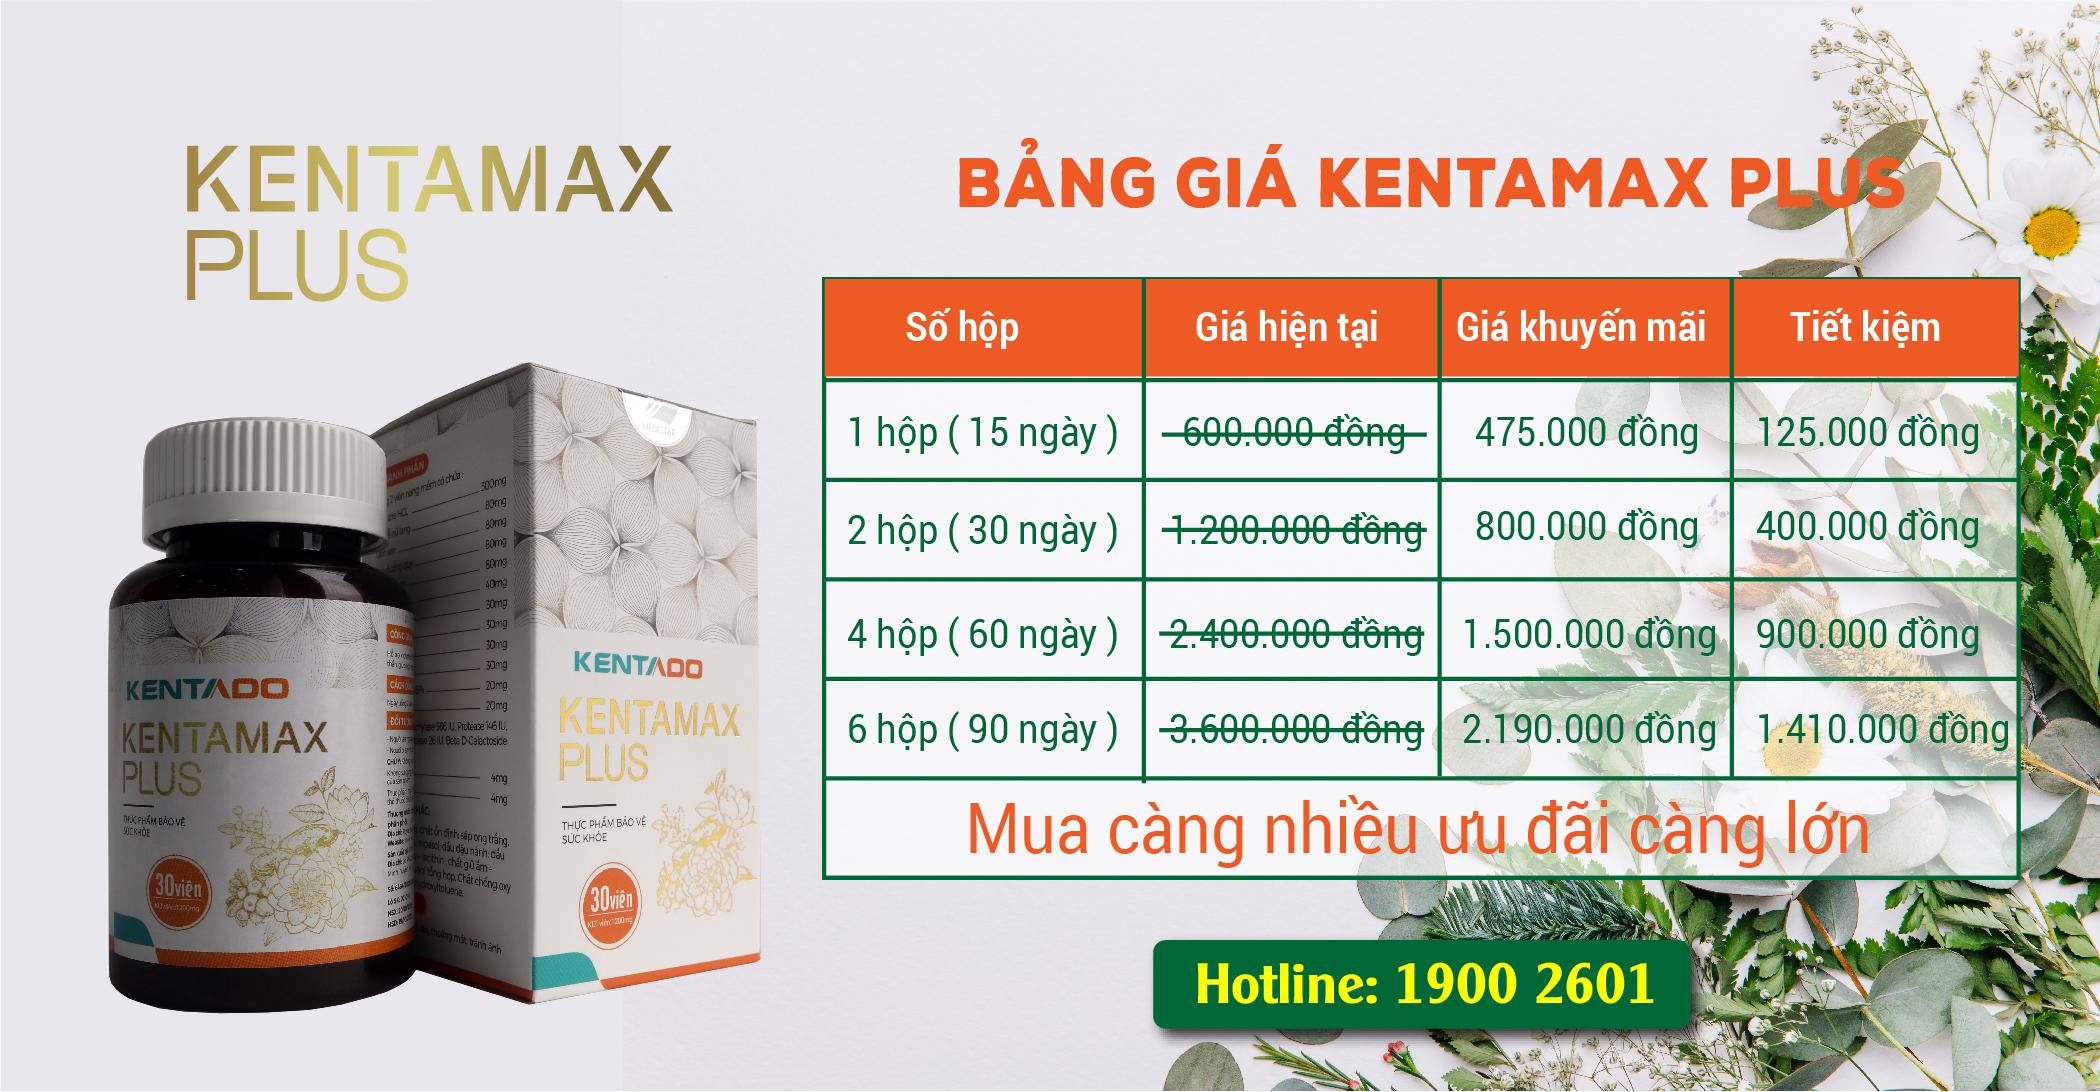 Bảng giá sản phẩm Kentamax Plus